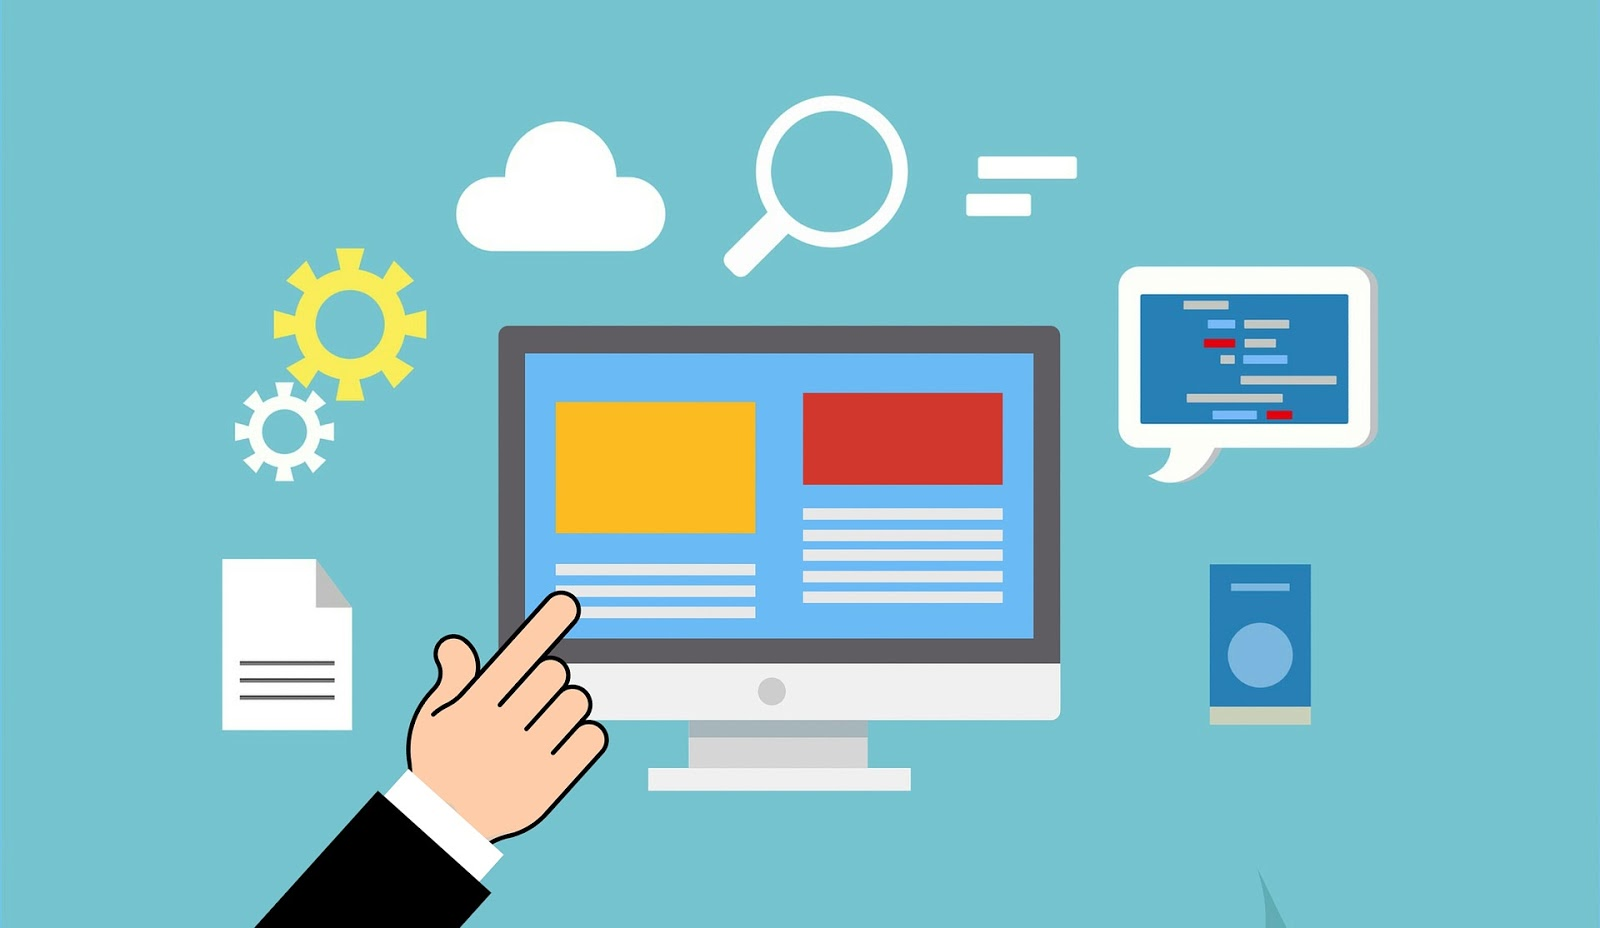 free hosting, free linux hosting, free web hosting, free cloud hosting